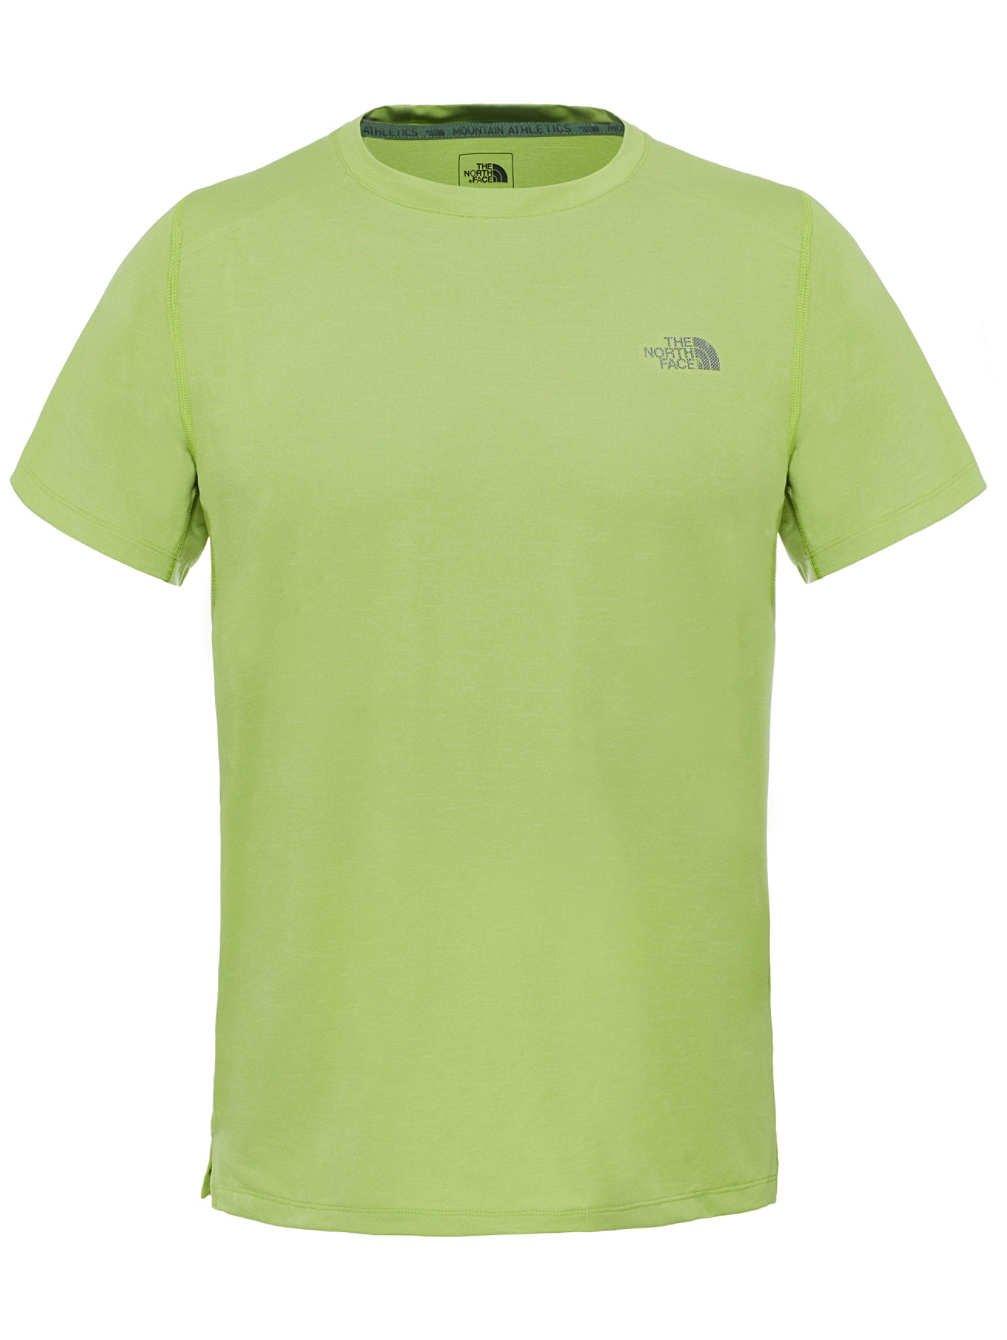 THE NORTH FACE Herren M Kilowatt S/S Crew Kurzärmeliges T-Shirt